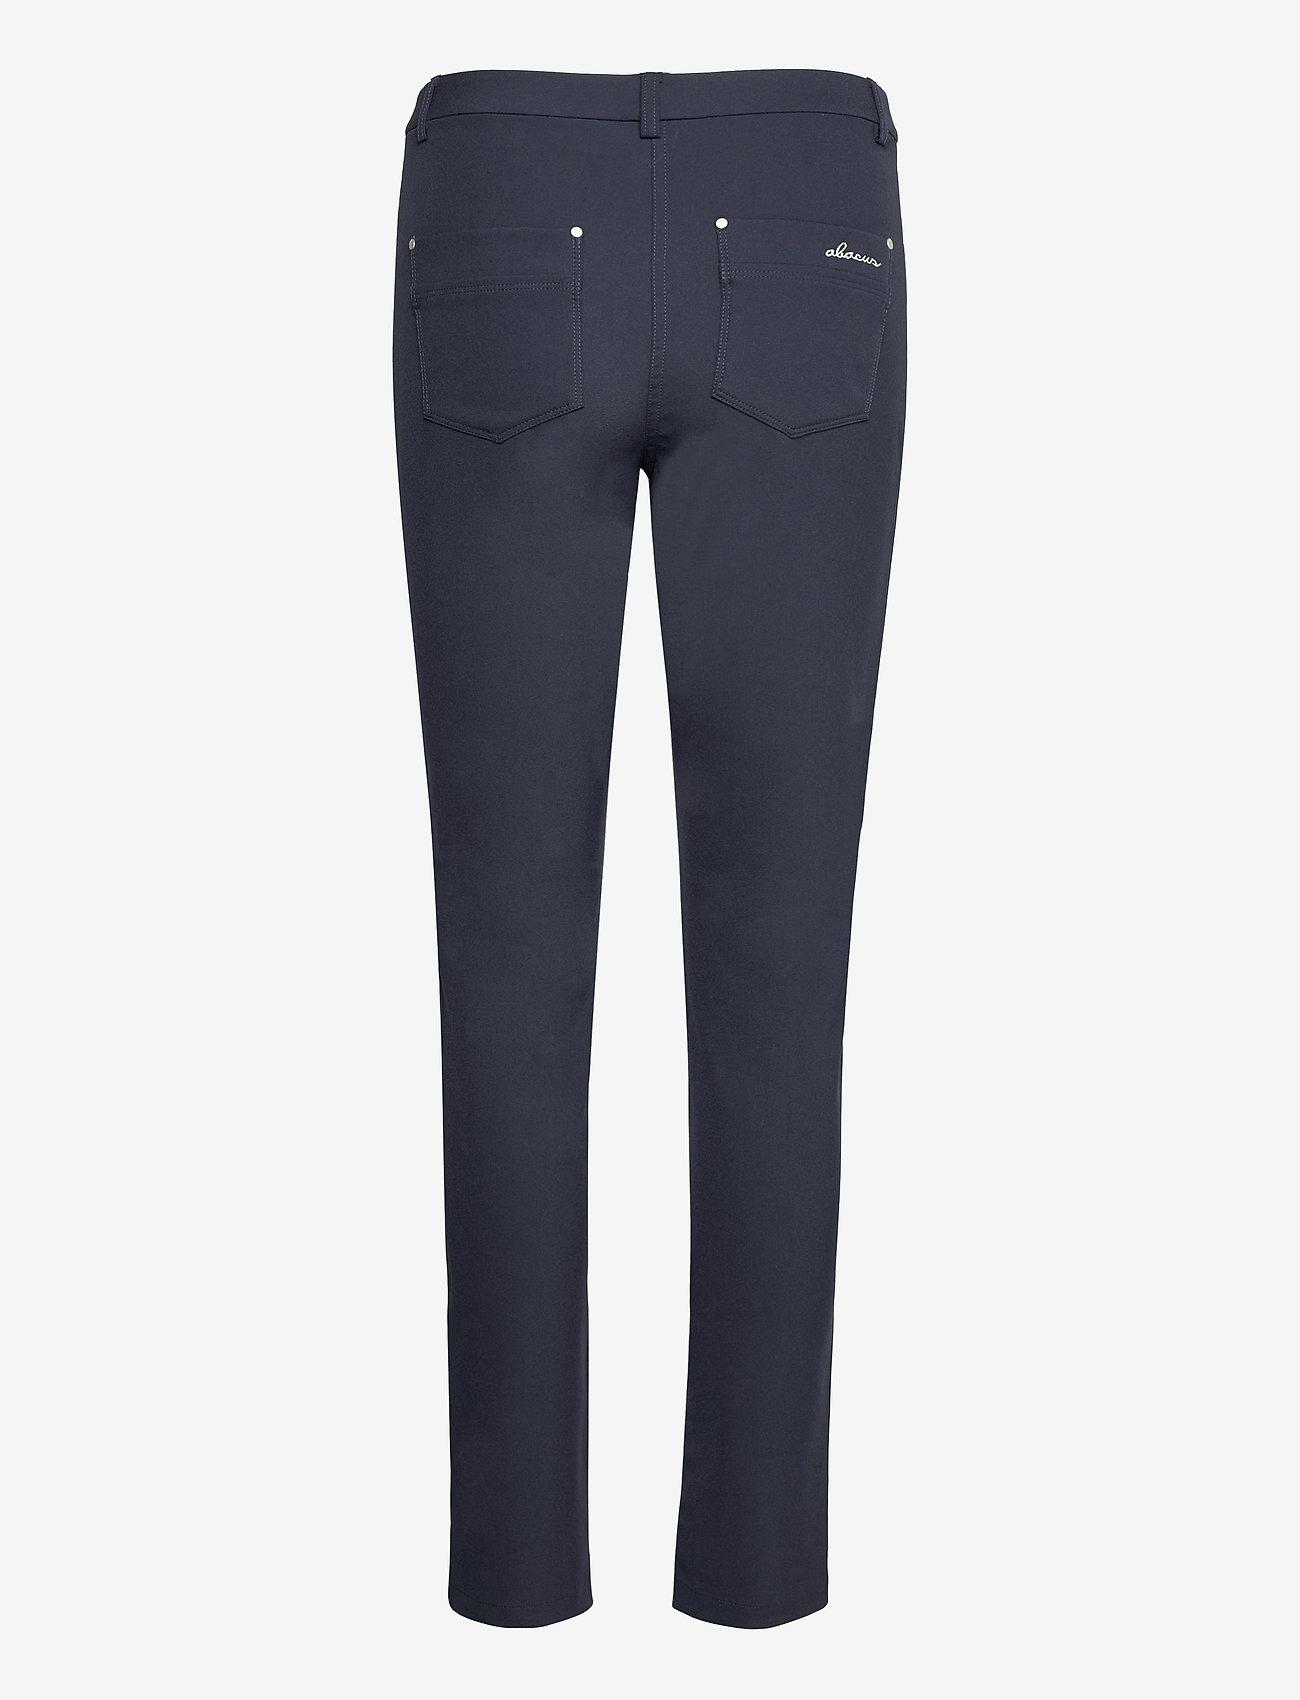 Abacus - Lds Grace trousers 103cm - golfbroeken - navy - 1